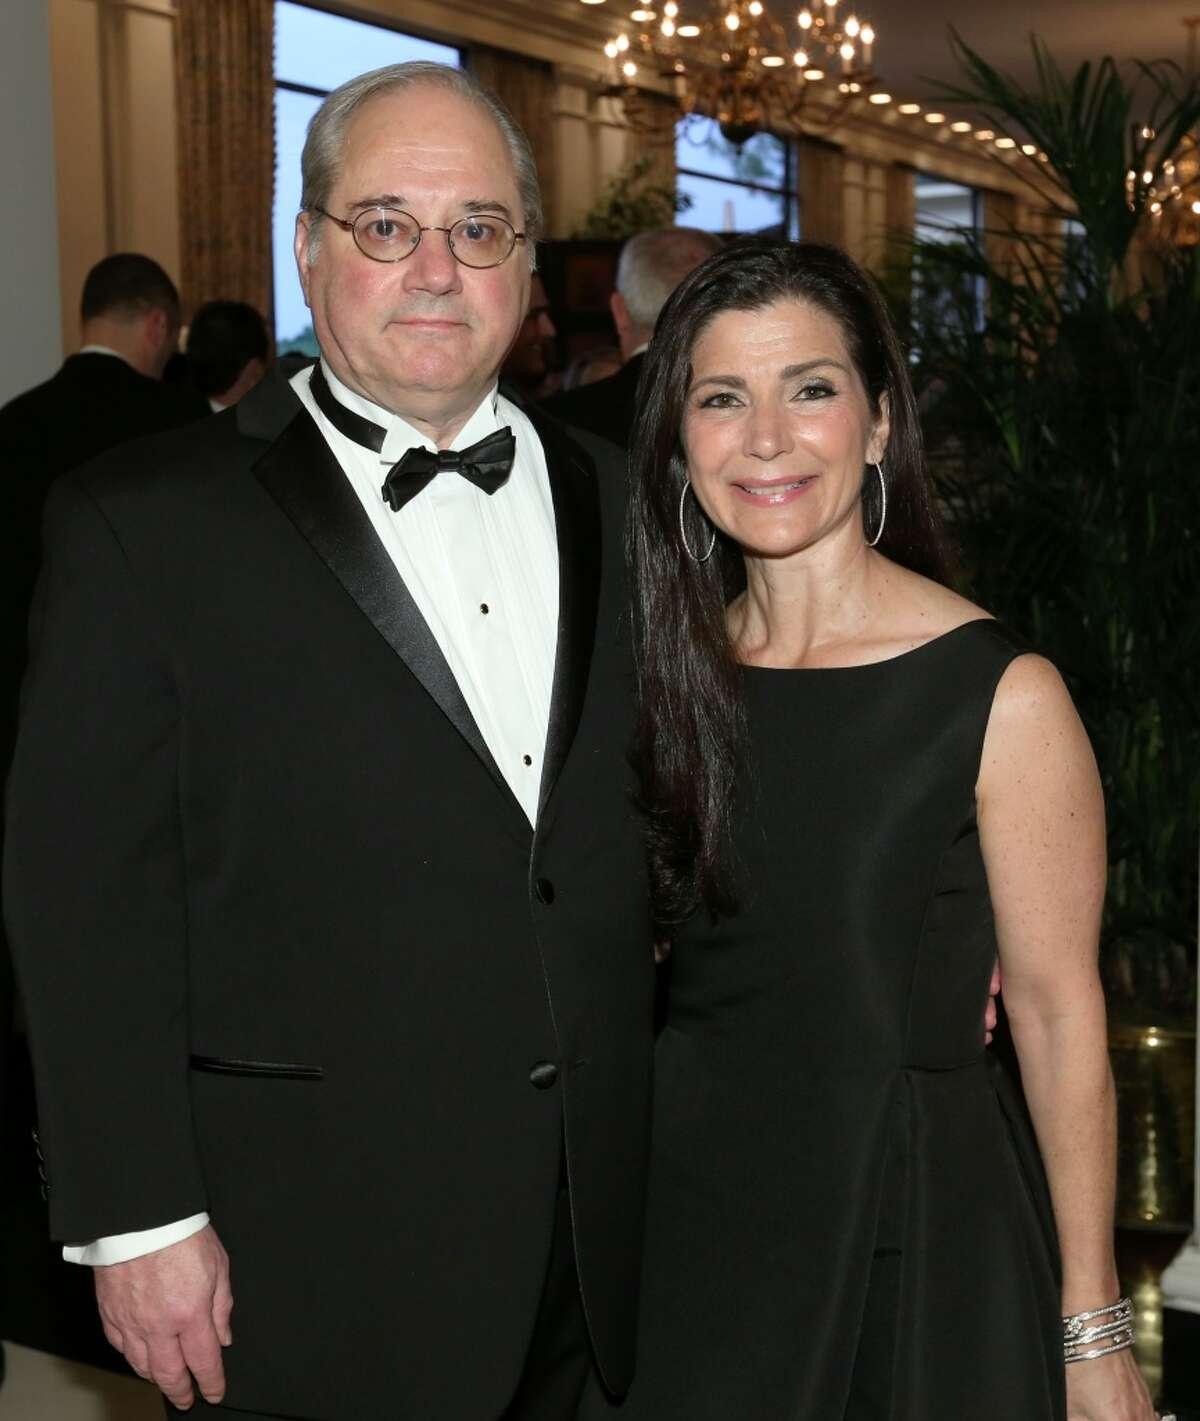 Anthony and Cynthia Petrello